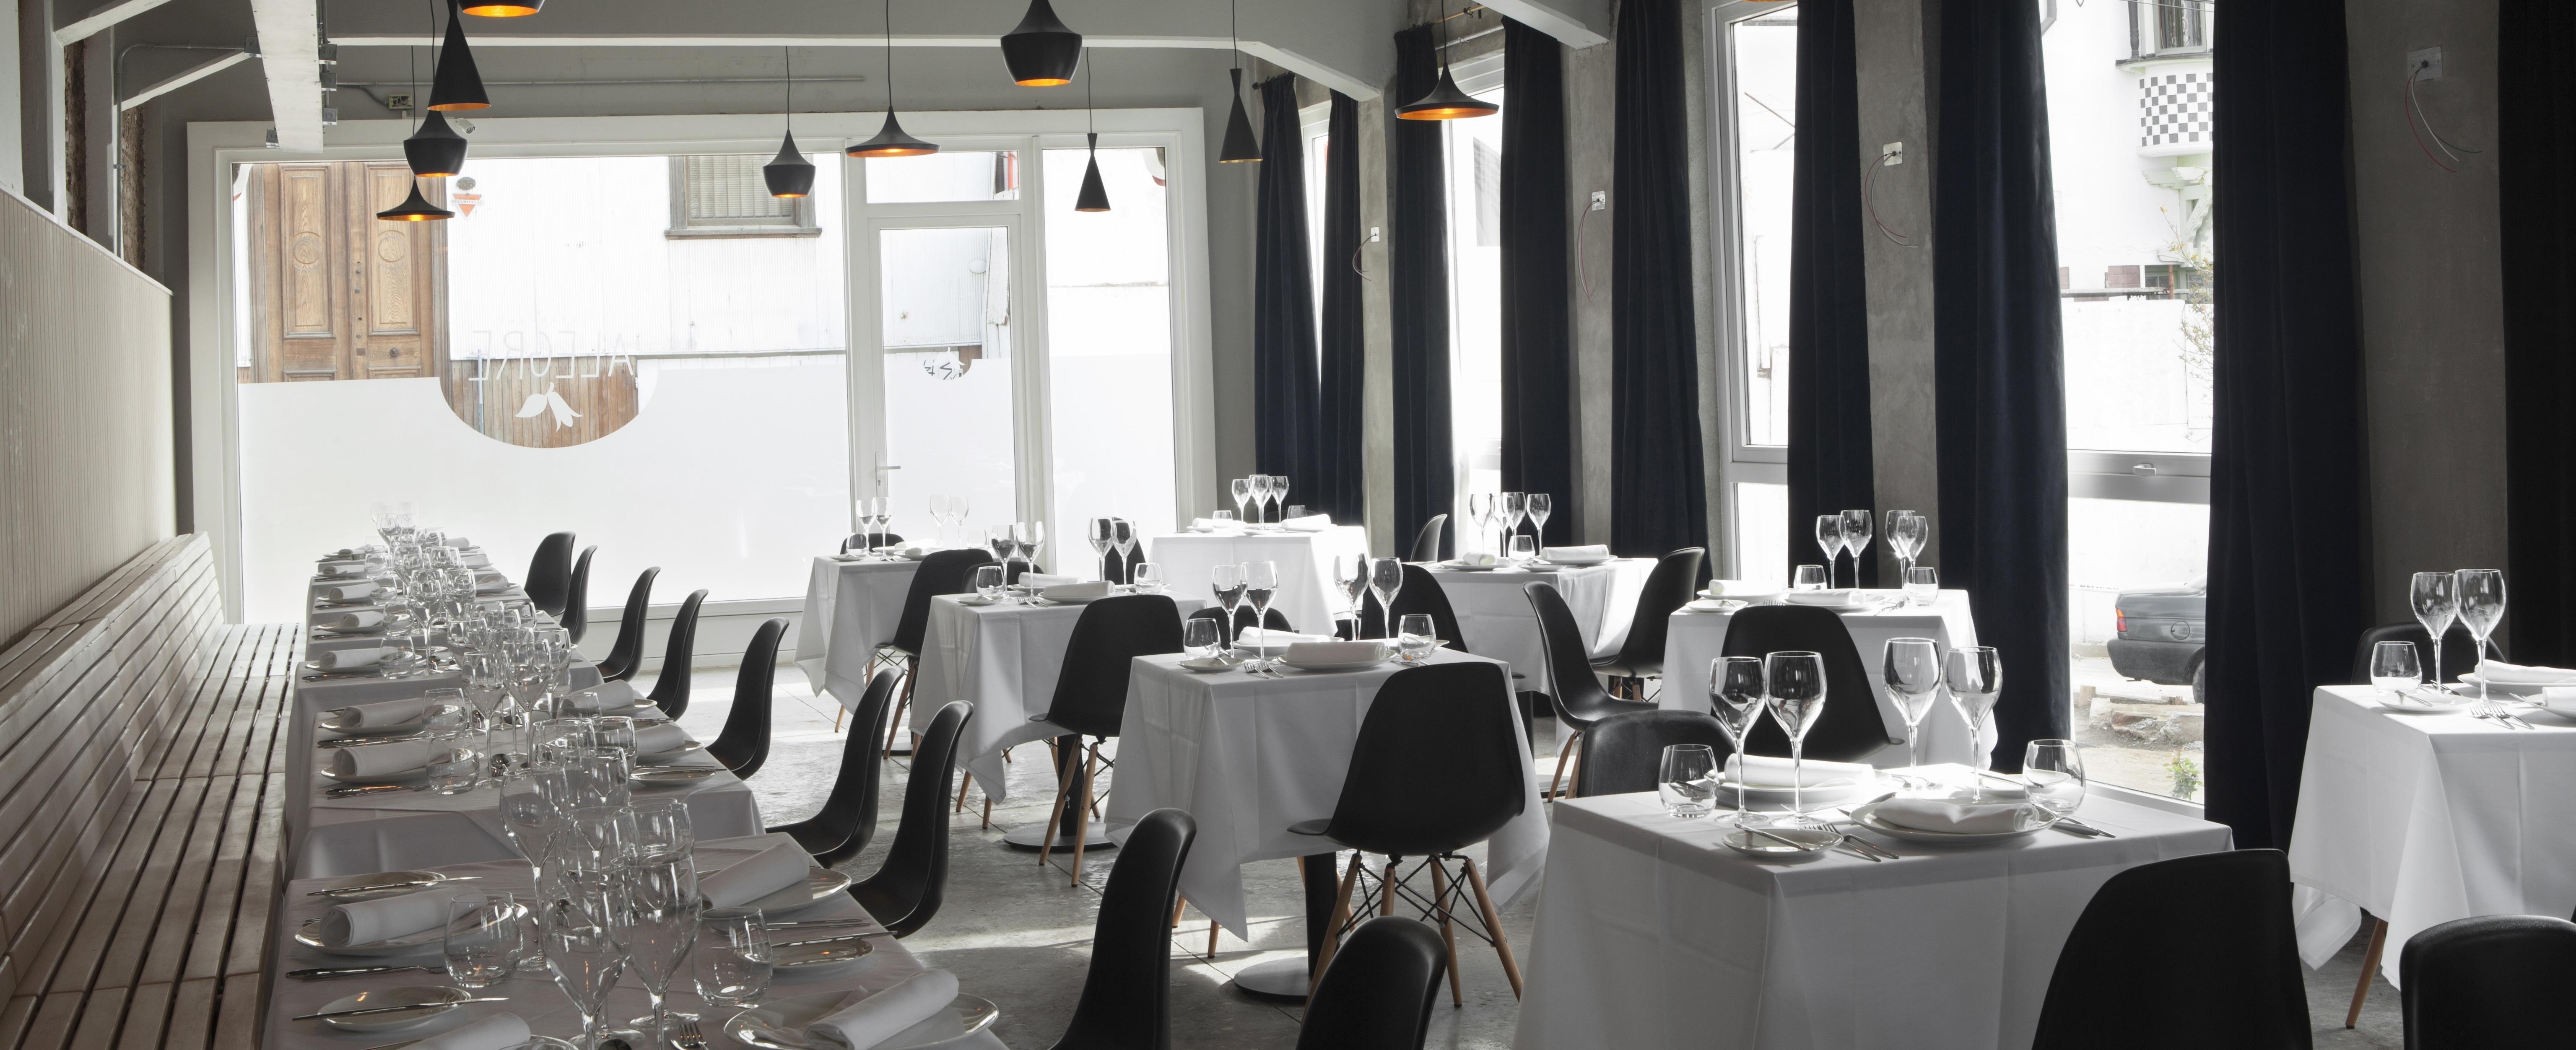 Restaurant_Alegre_Valparaiso